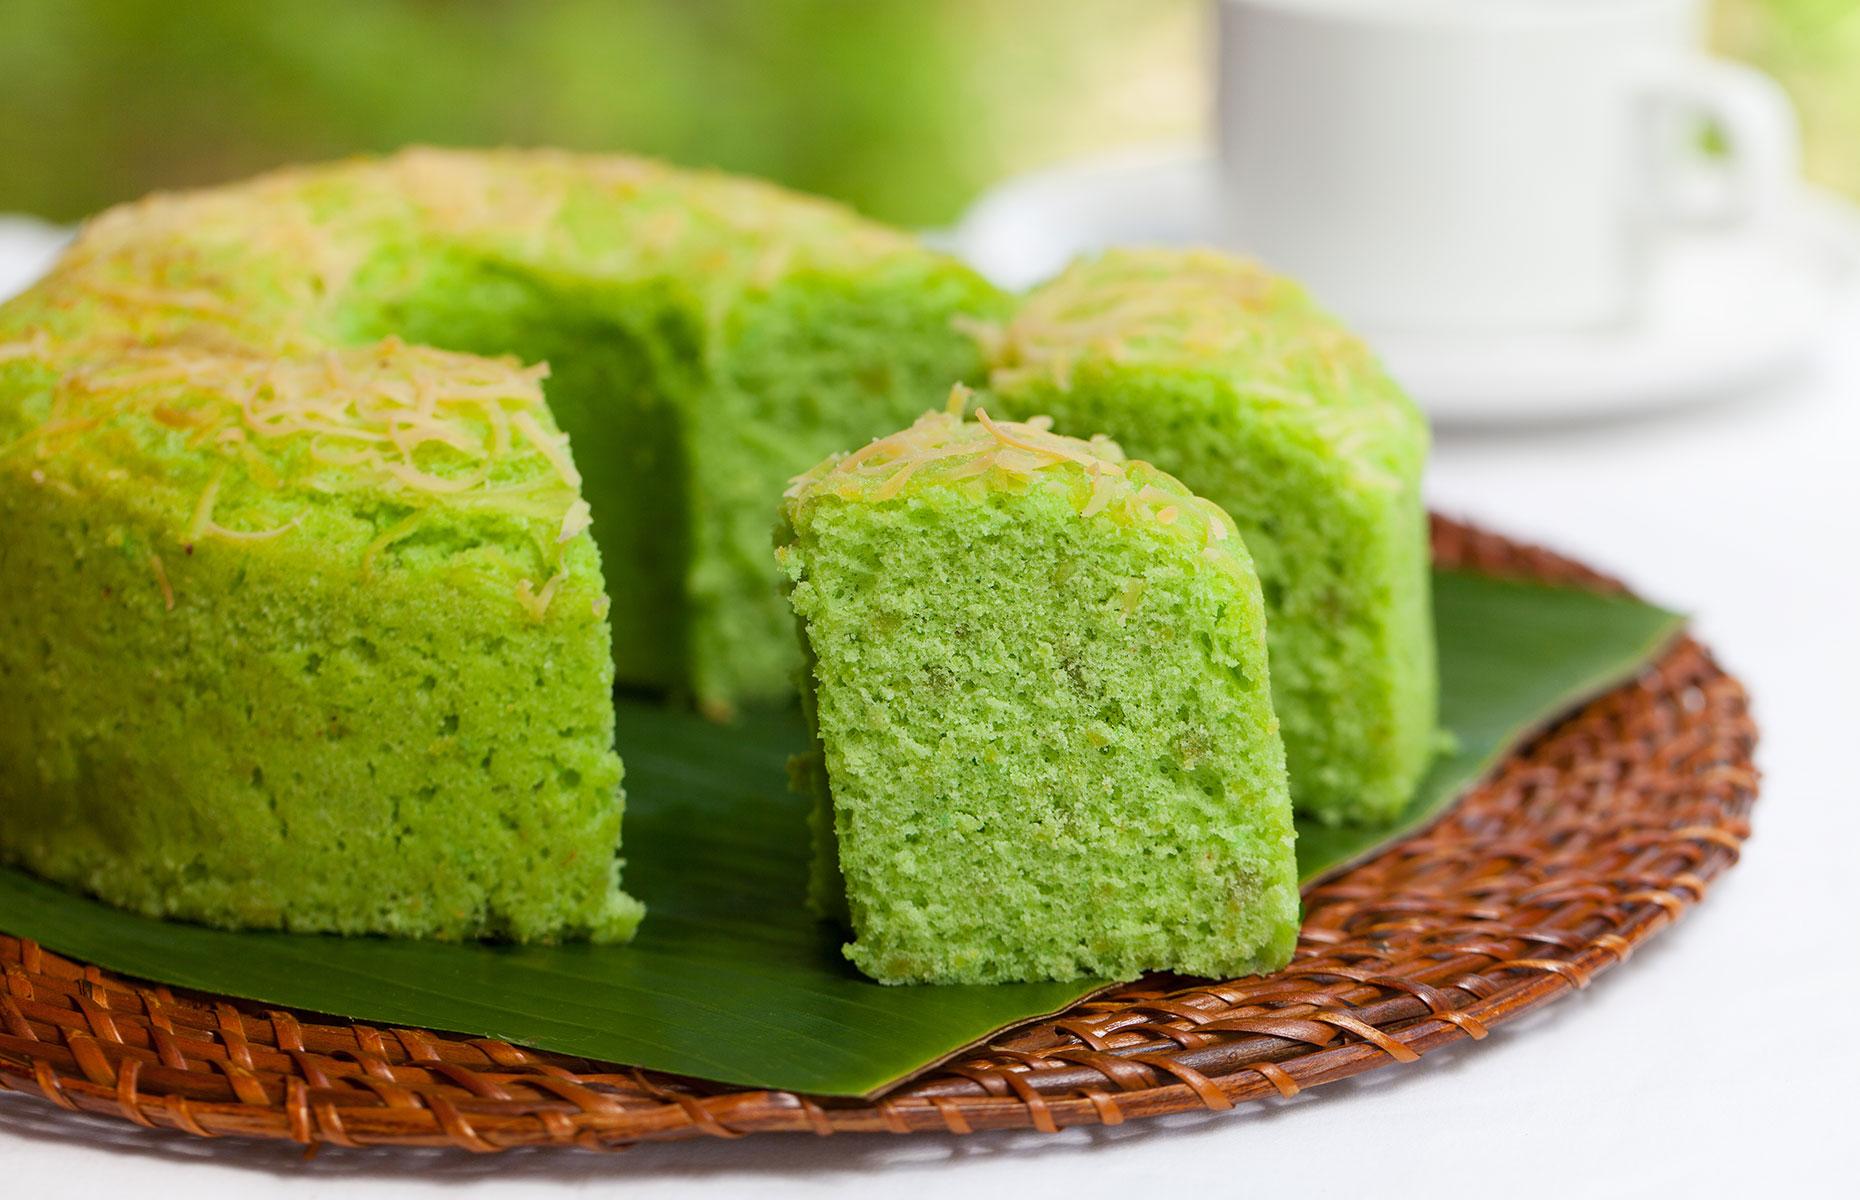 Pandan cake (Image: Anna_Pustynnikova/Shutterstock)